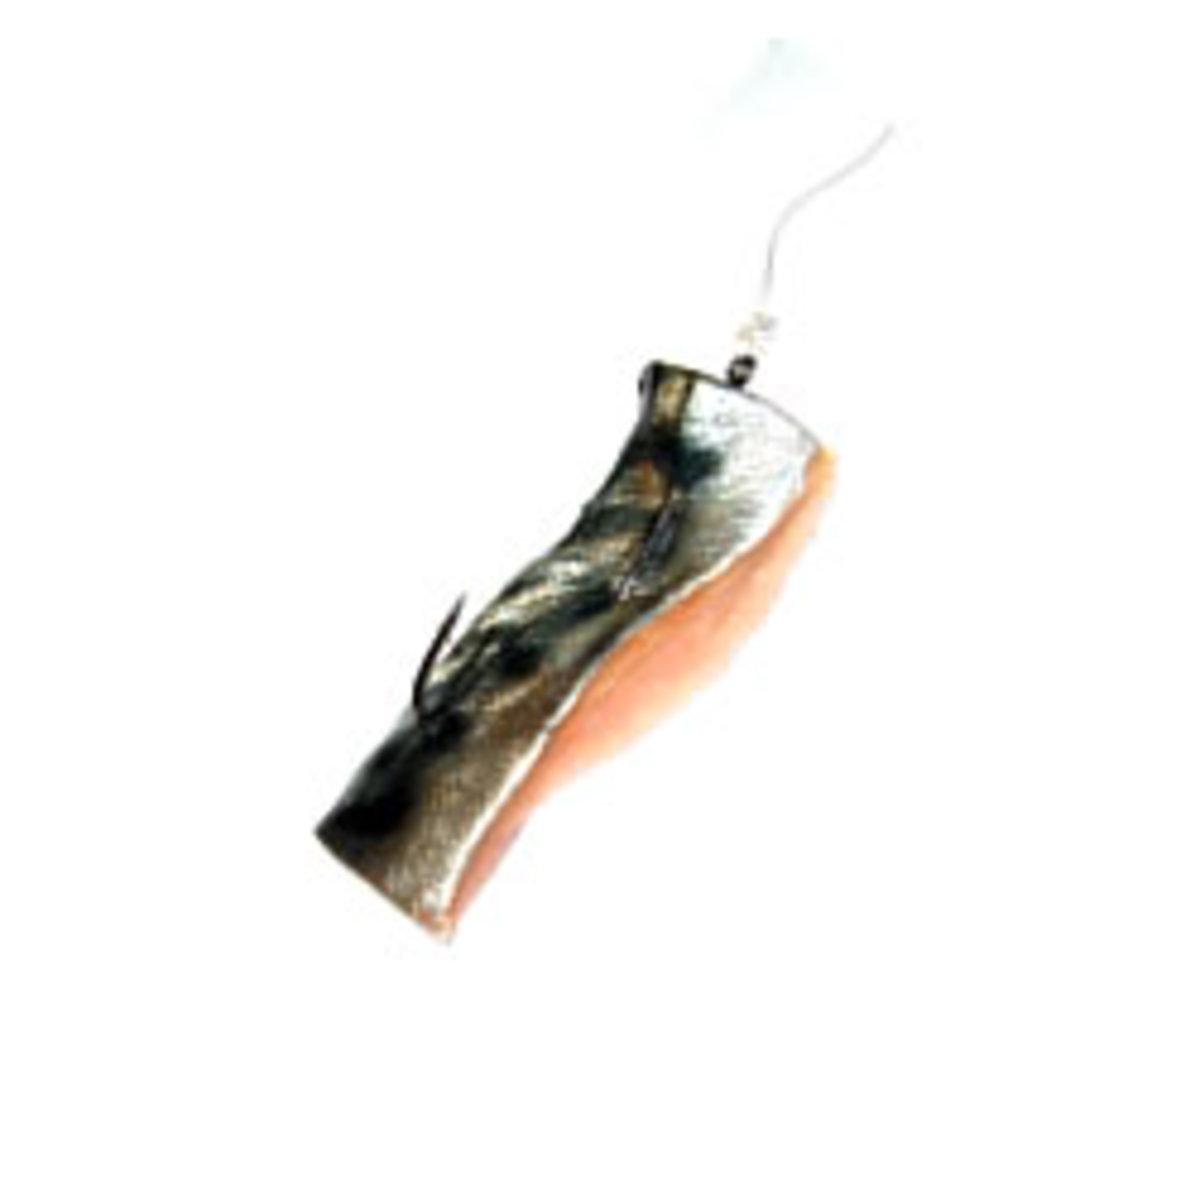 Mackerel baited hook